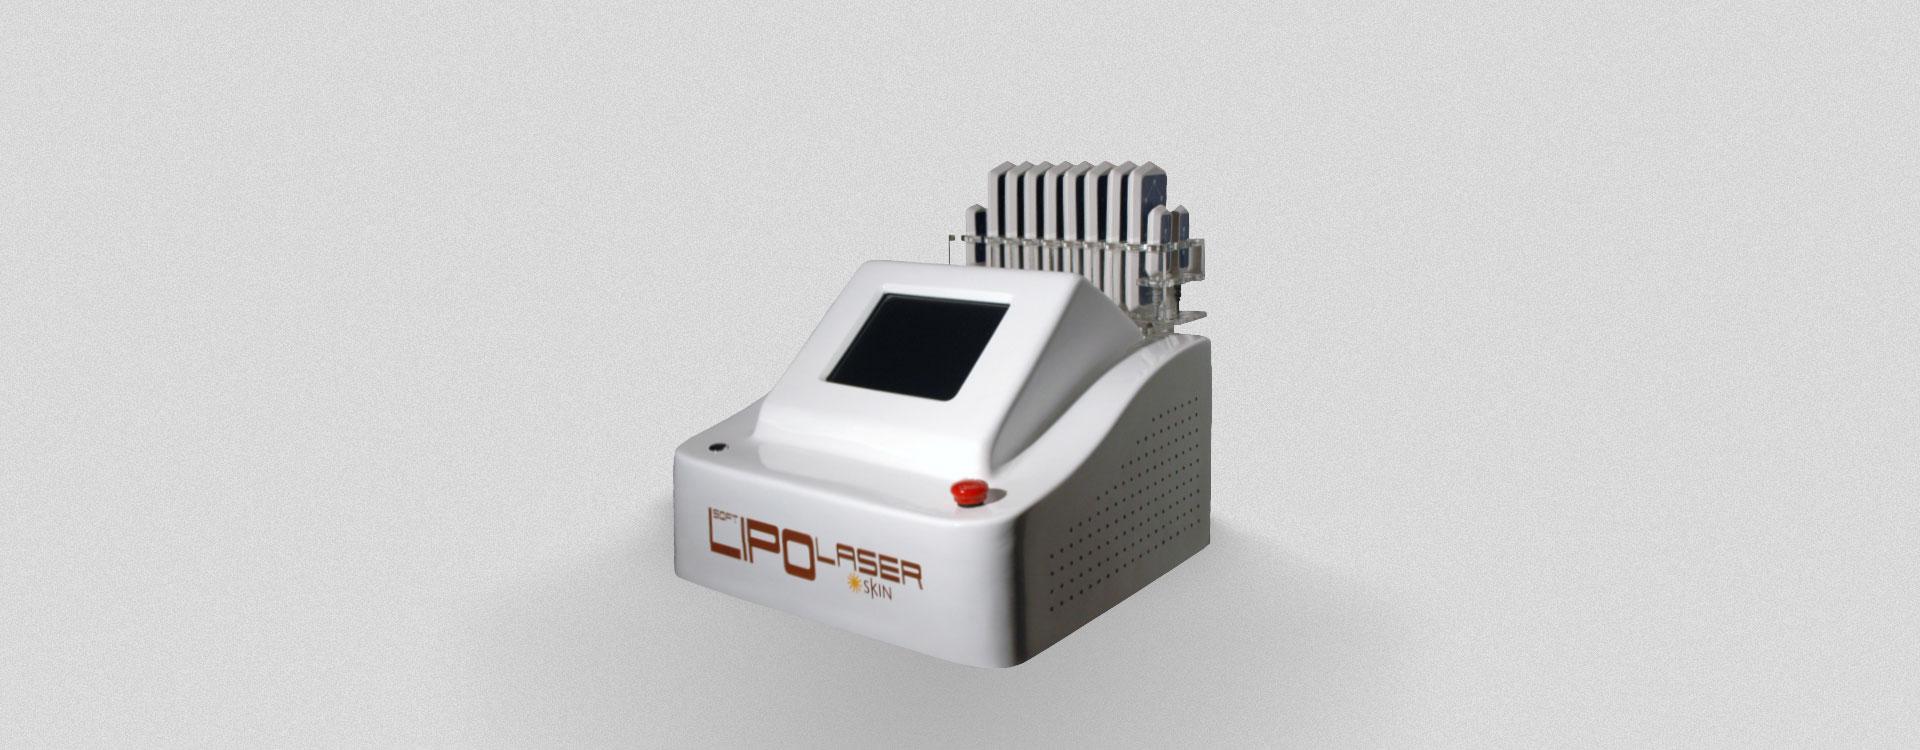 lipolaser1920x750